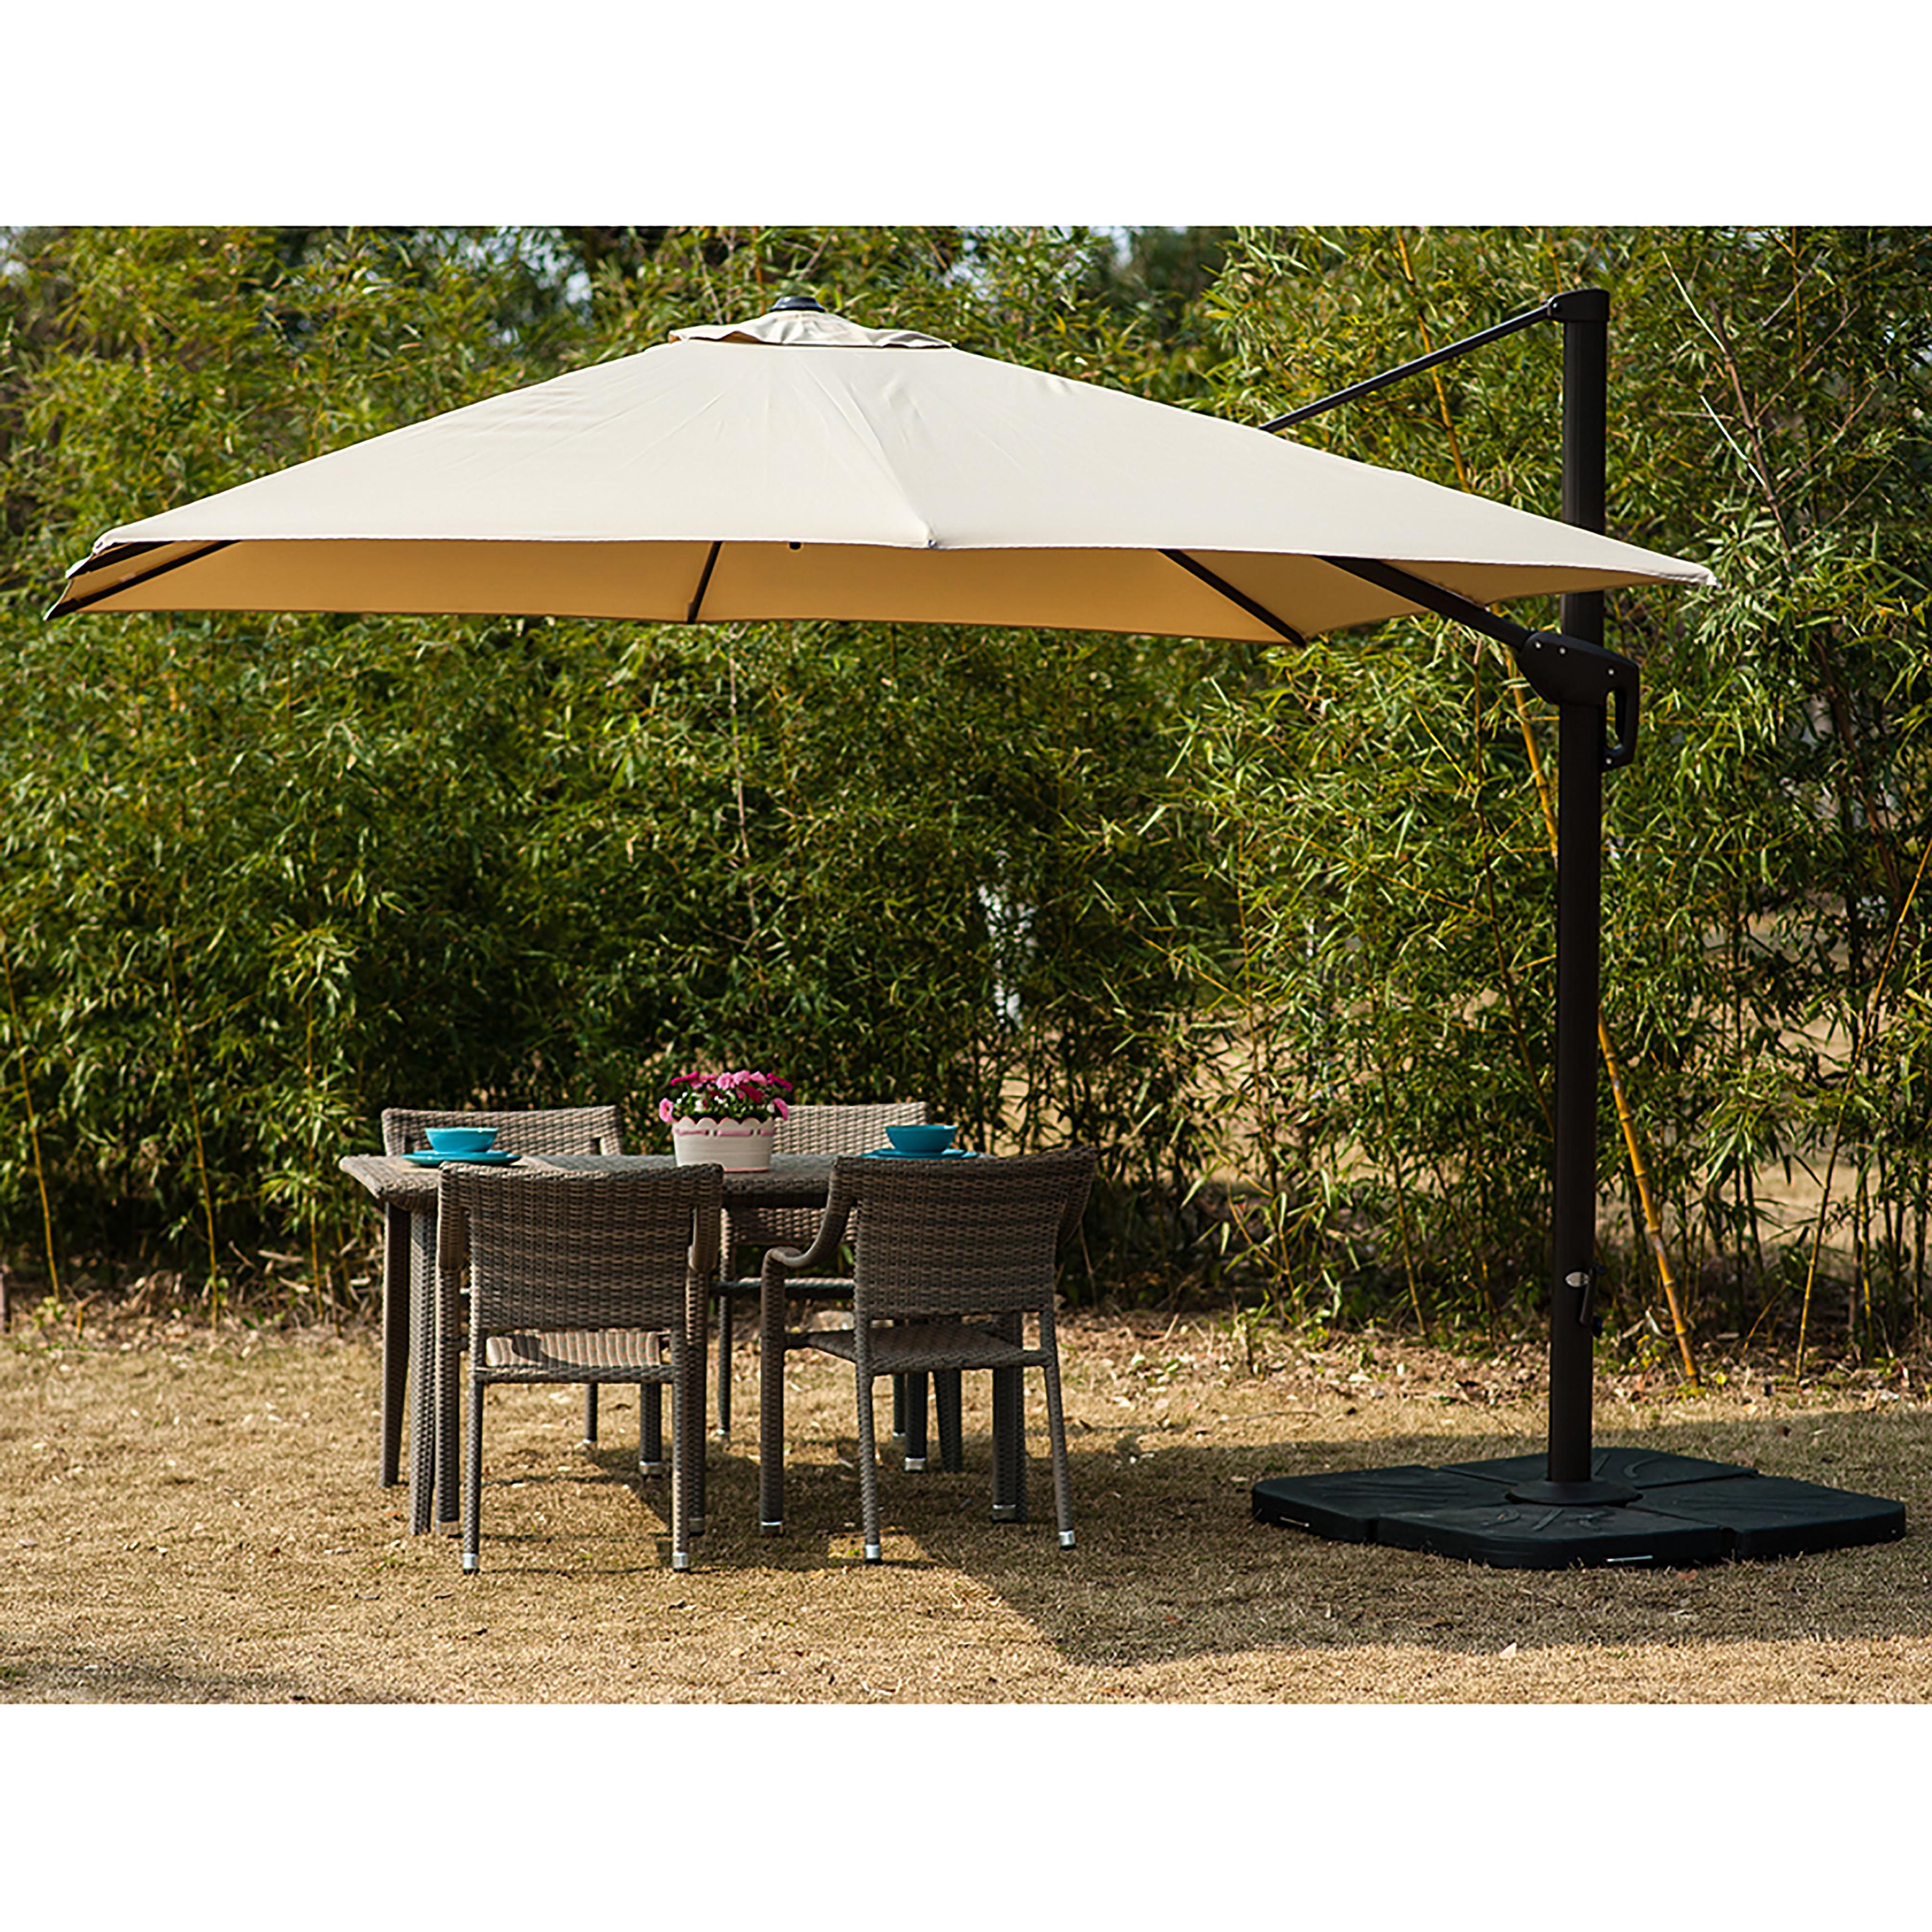 2020 Lia 10' Cantilever Umbrella In Ketcham Cantilever Umbrellas (View 3 of 20)